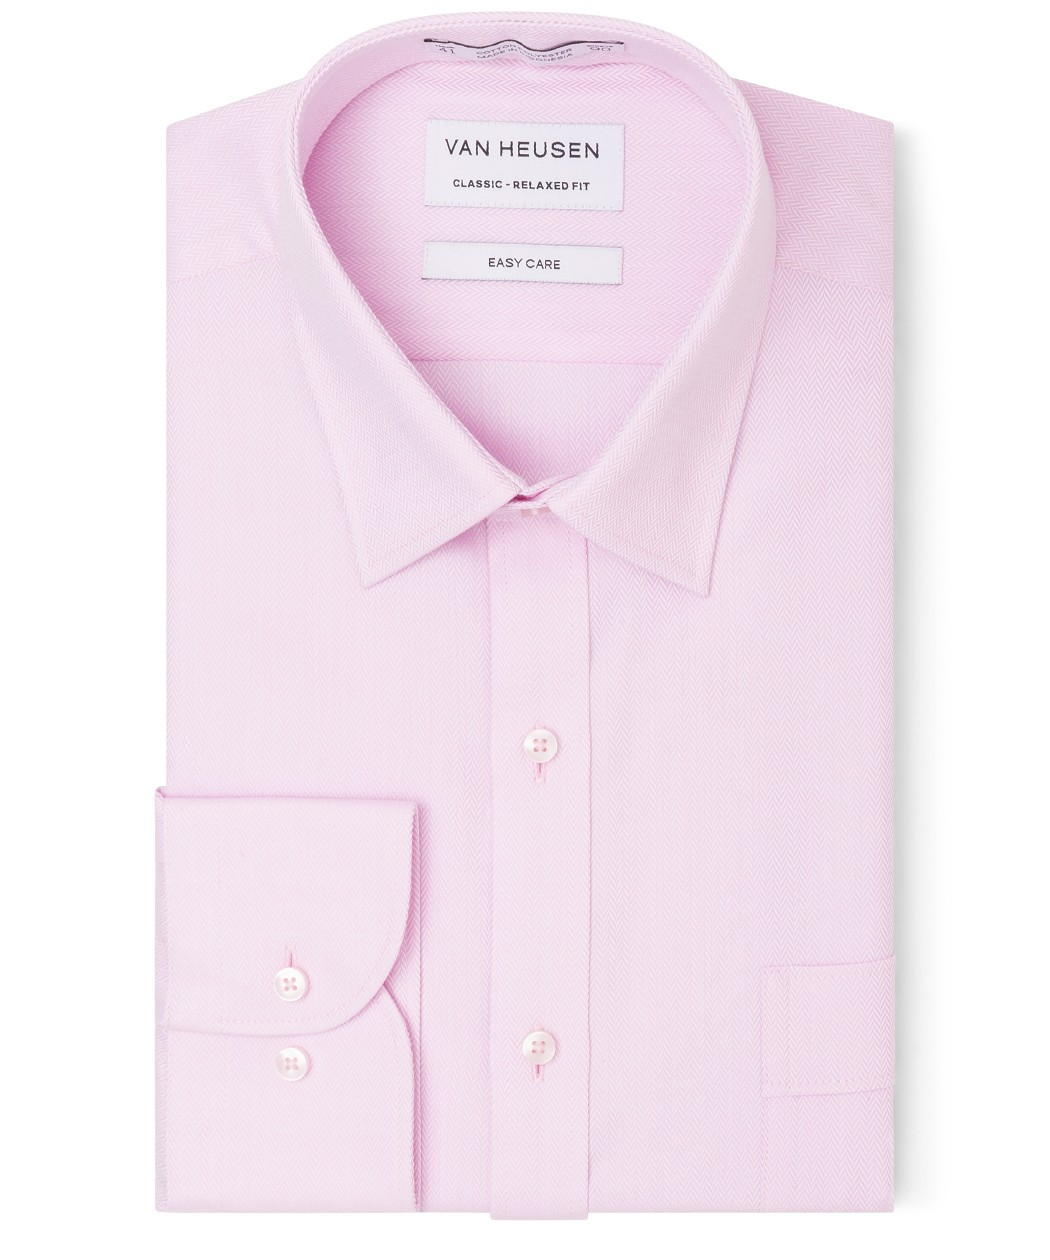 Classic Relaxed Fit Shirt Pink Herringbone Van Heusen Business